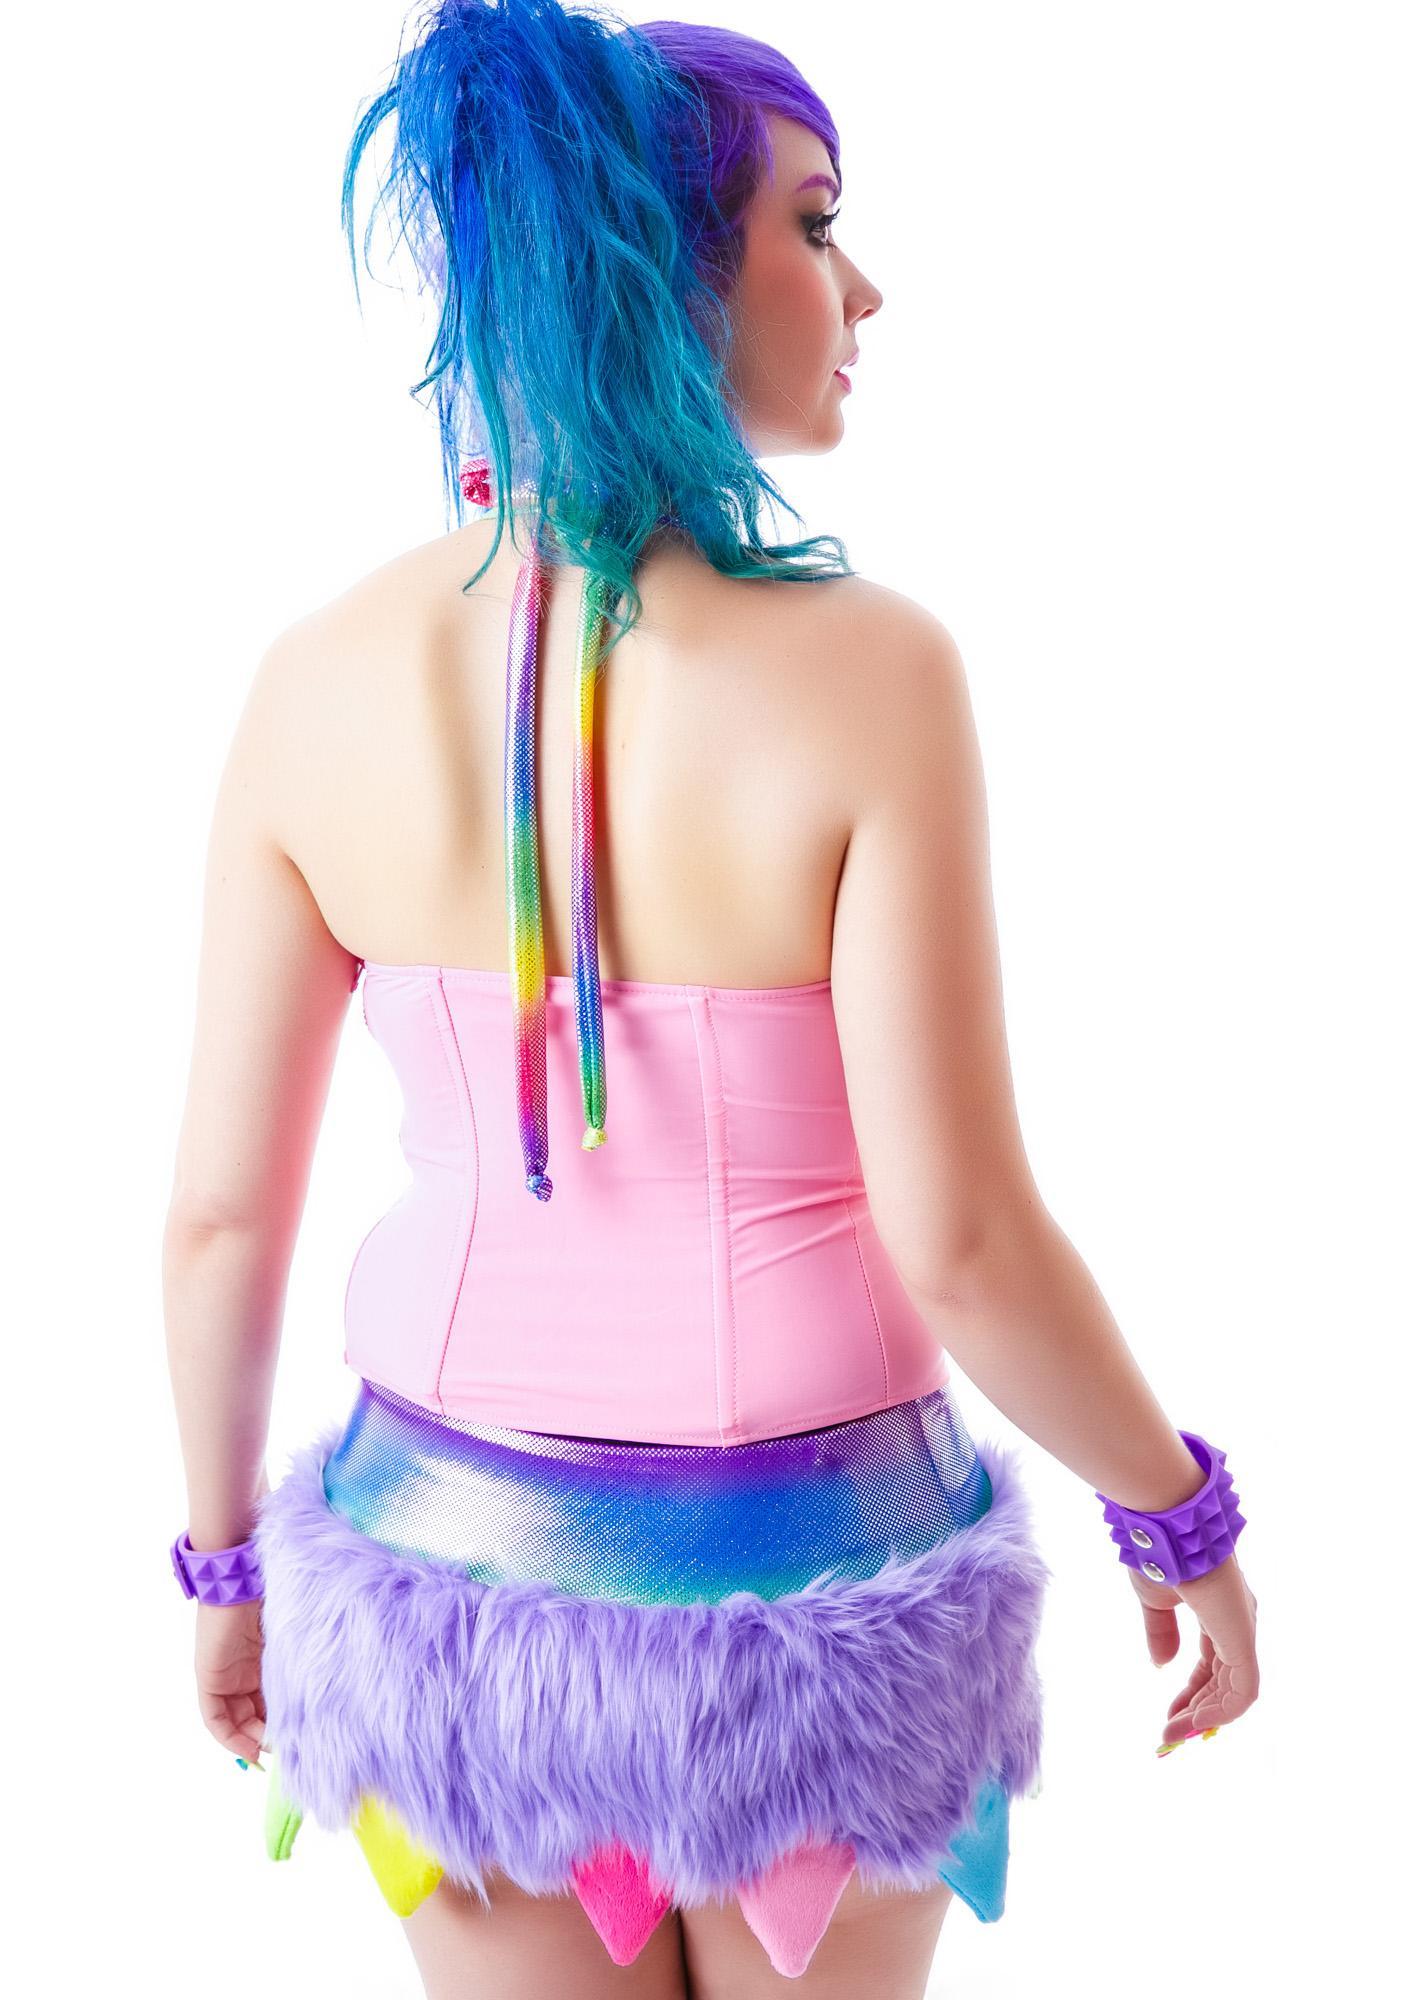 J Valentine Dragonheart Skirt Set